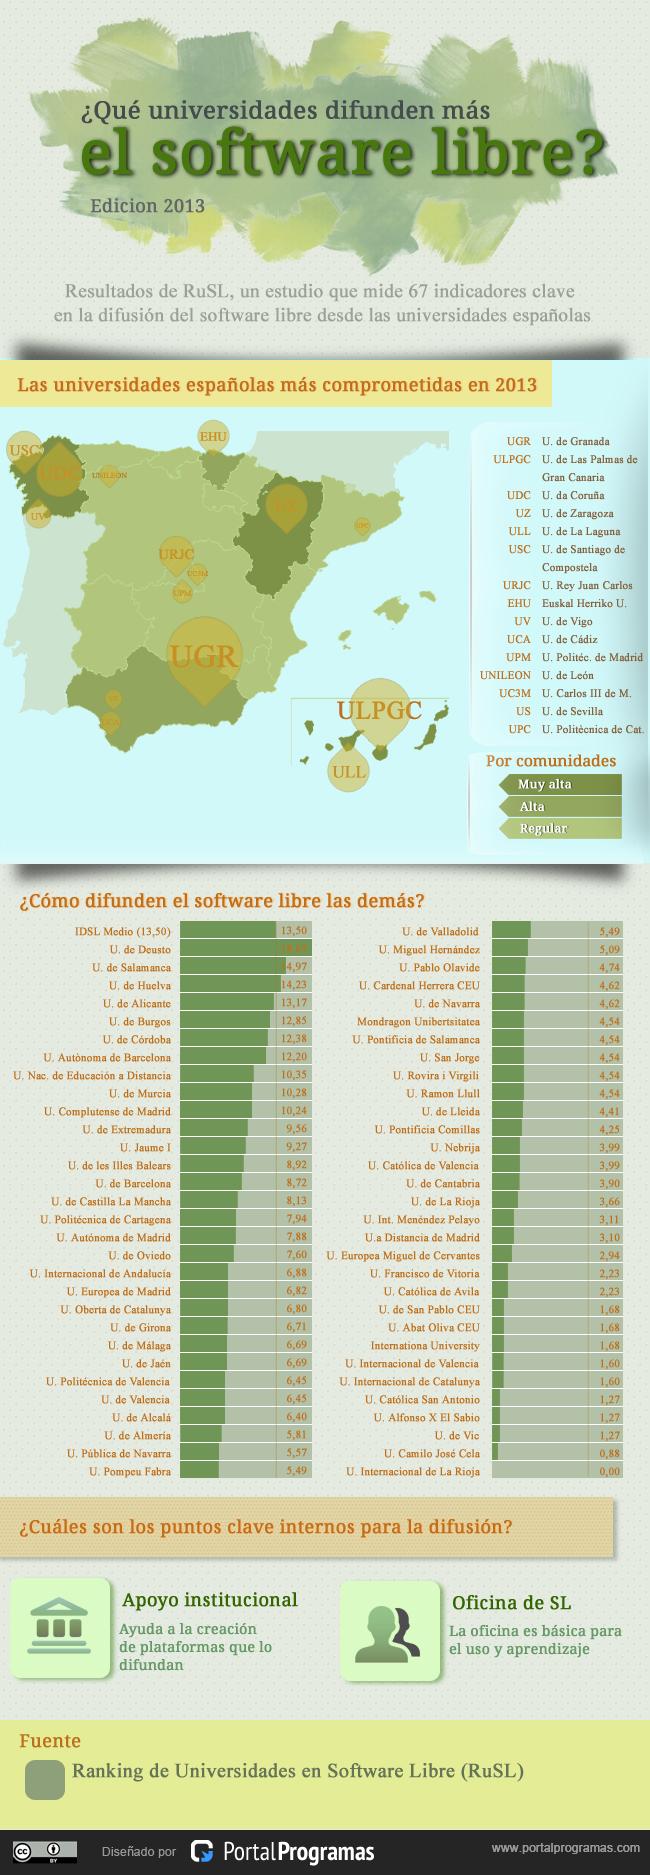 Las universidades españolas en software libre - PortalProgramas